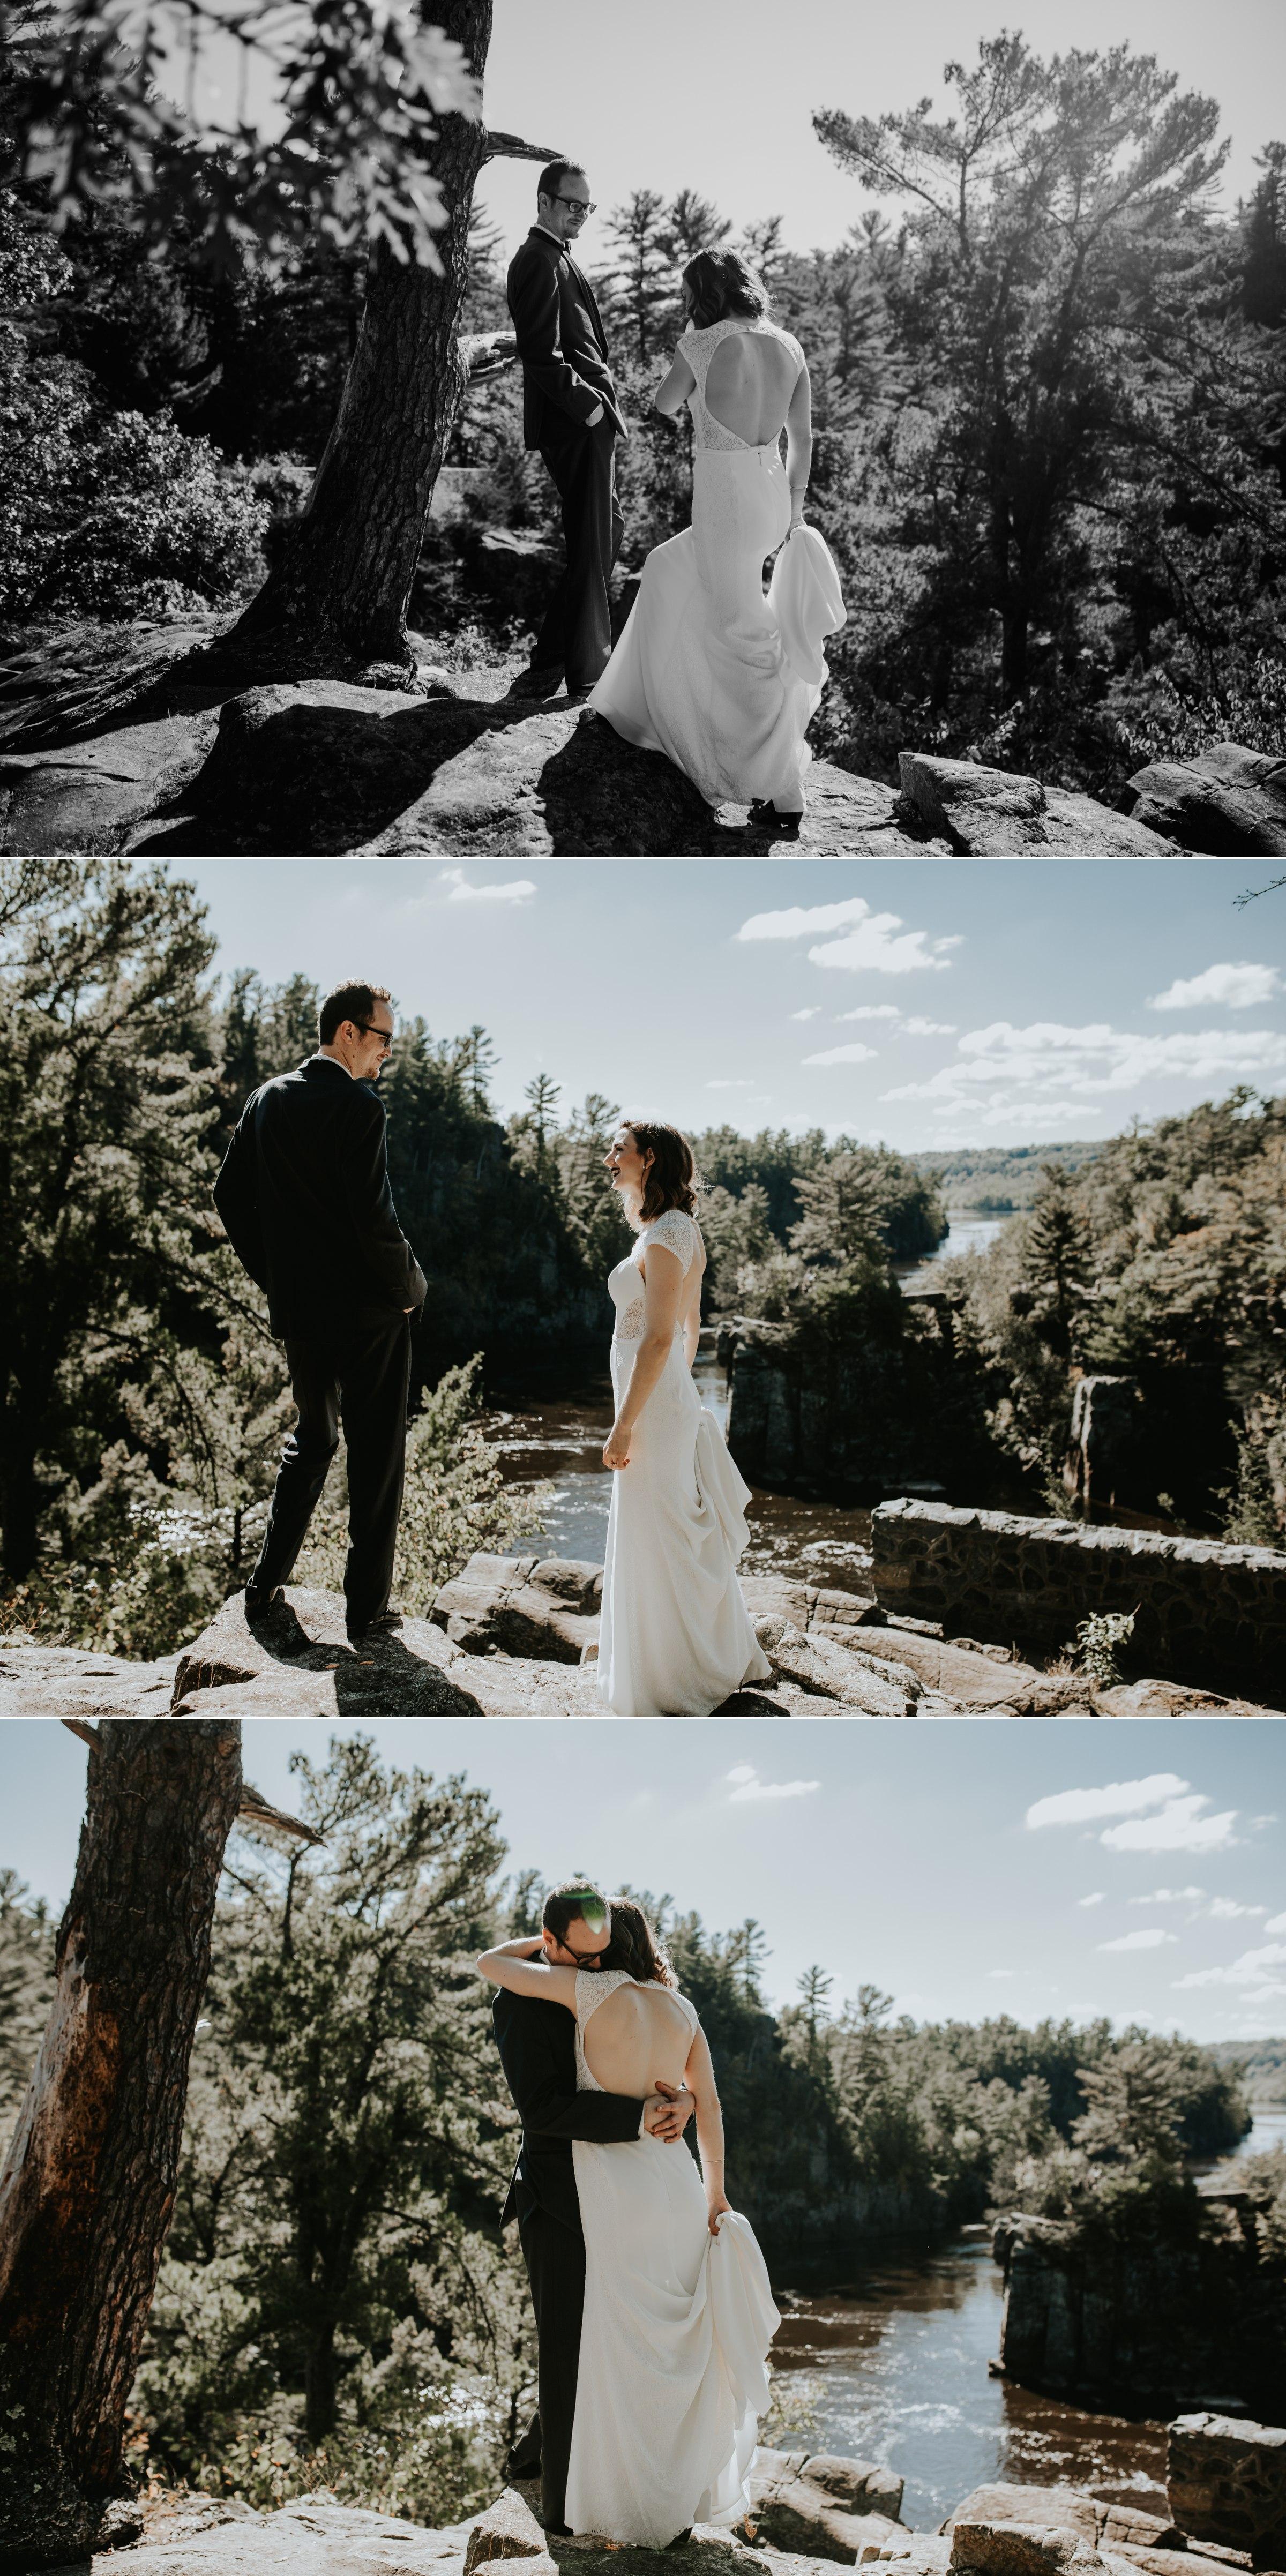 caroline and taylor minneapolis minnesota texas austin dallas houston wedding elopement destination intimate adventurous couple best photographer_0210.jpg